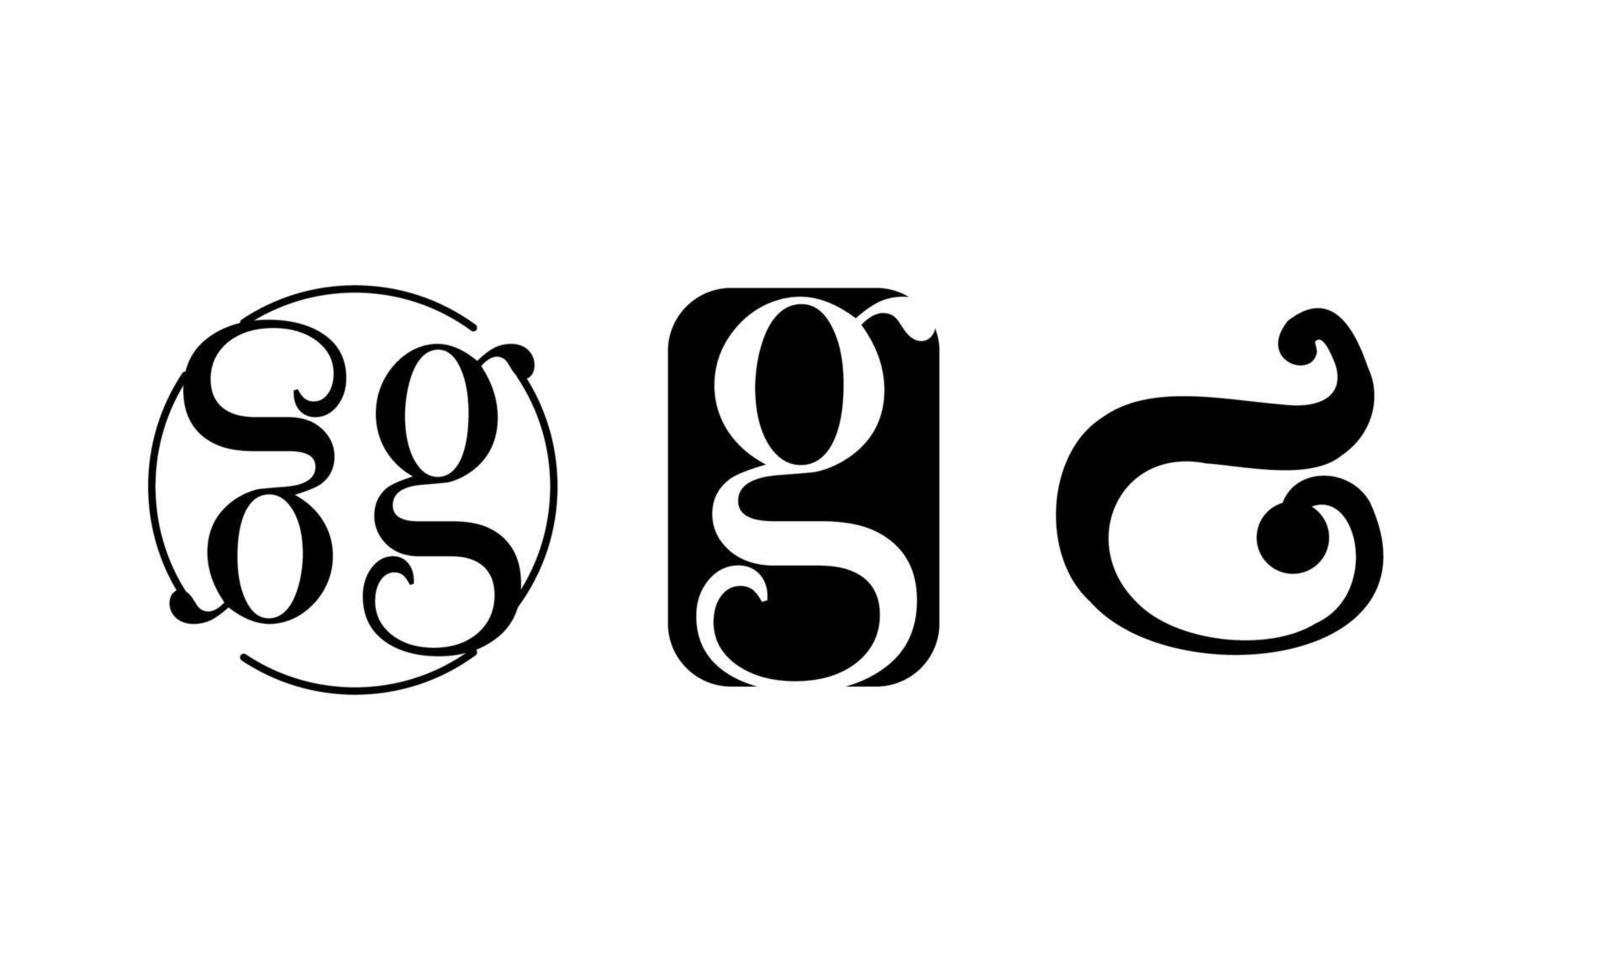 anfänglicher g kreativer Logo-Entwurfsschablonenvektor vektor